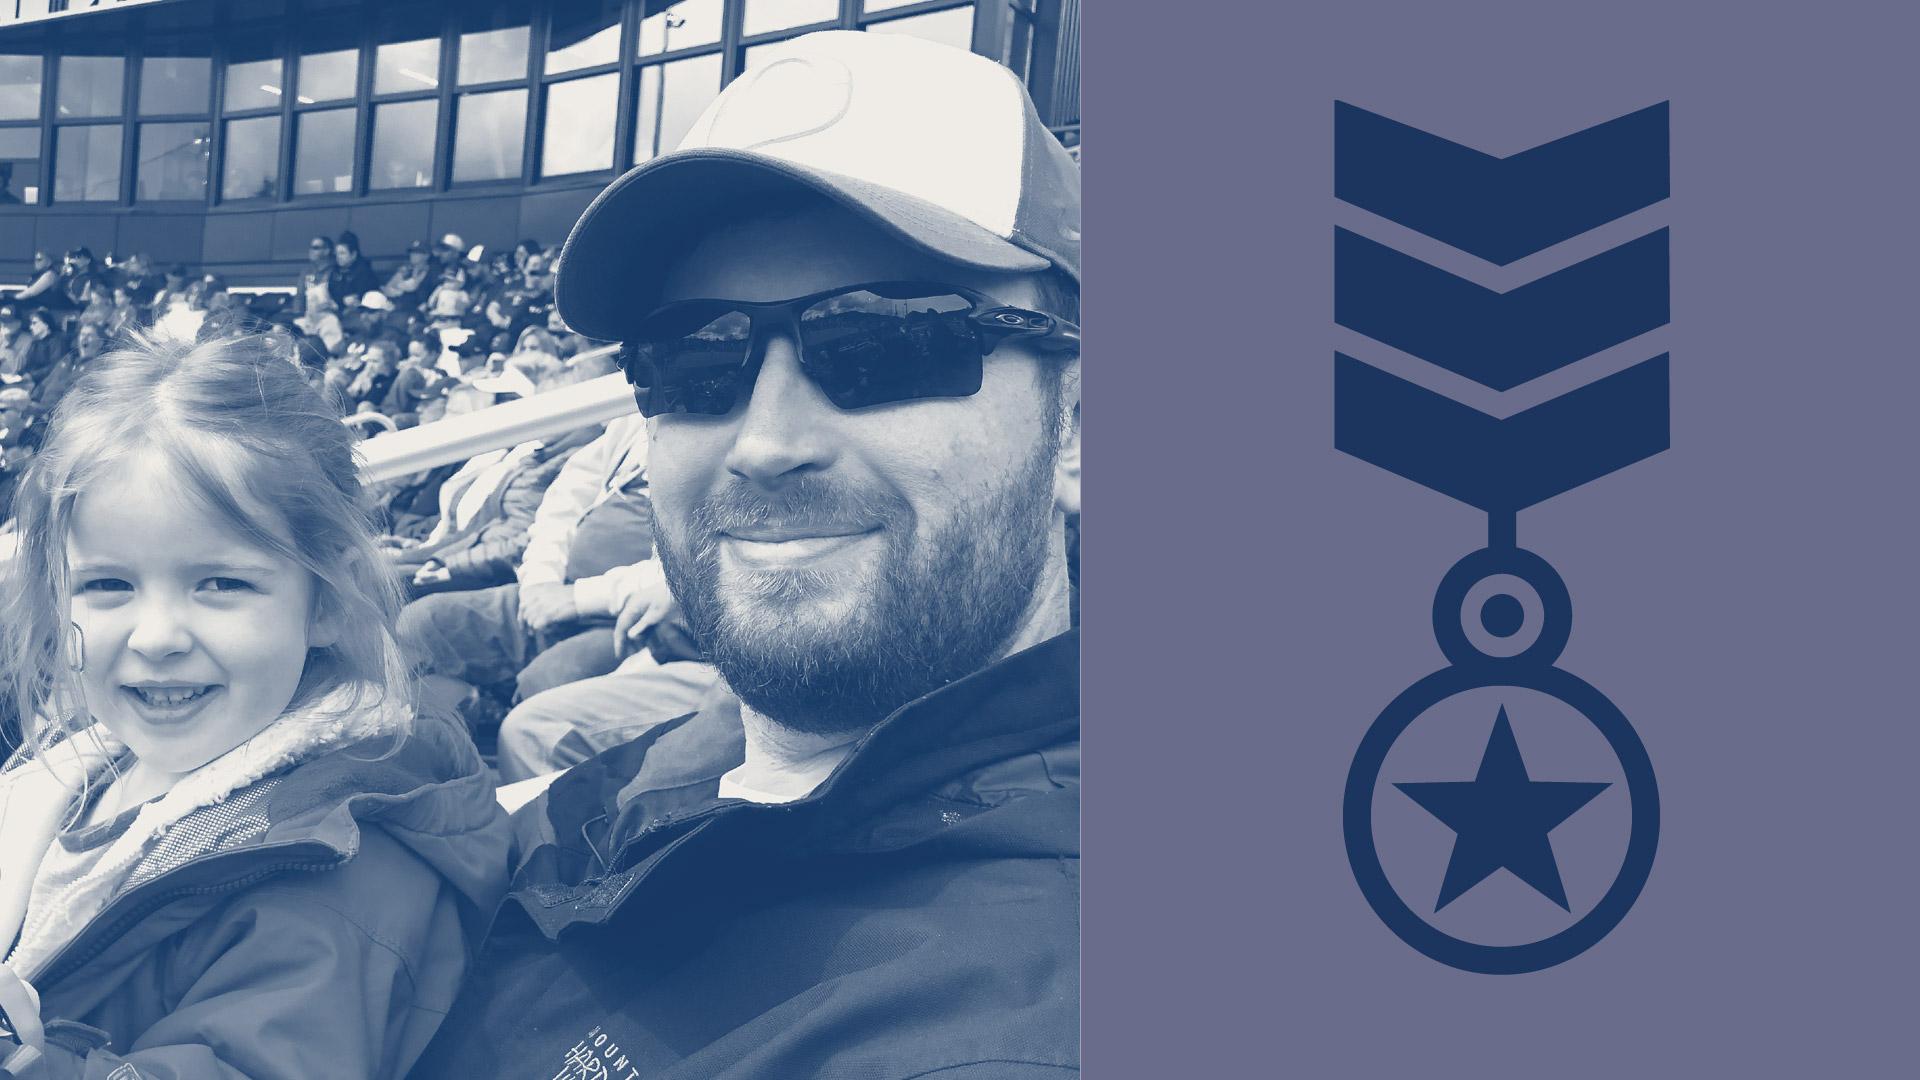 Meet U.S. Army veteran and software developer Brent McManus